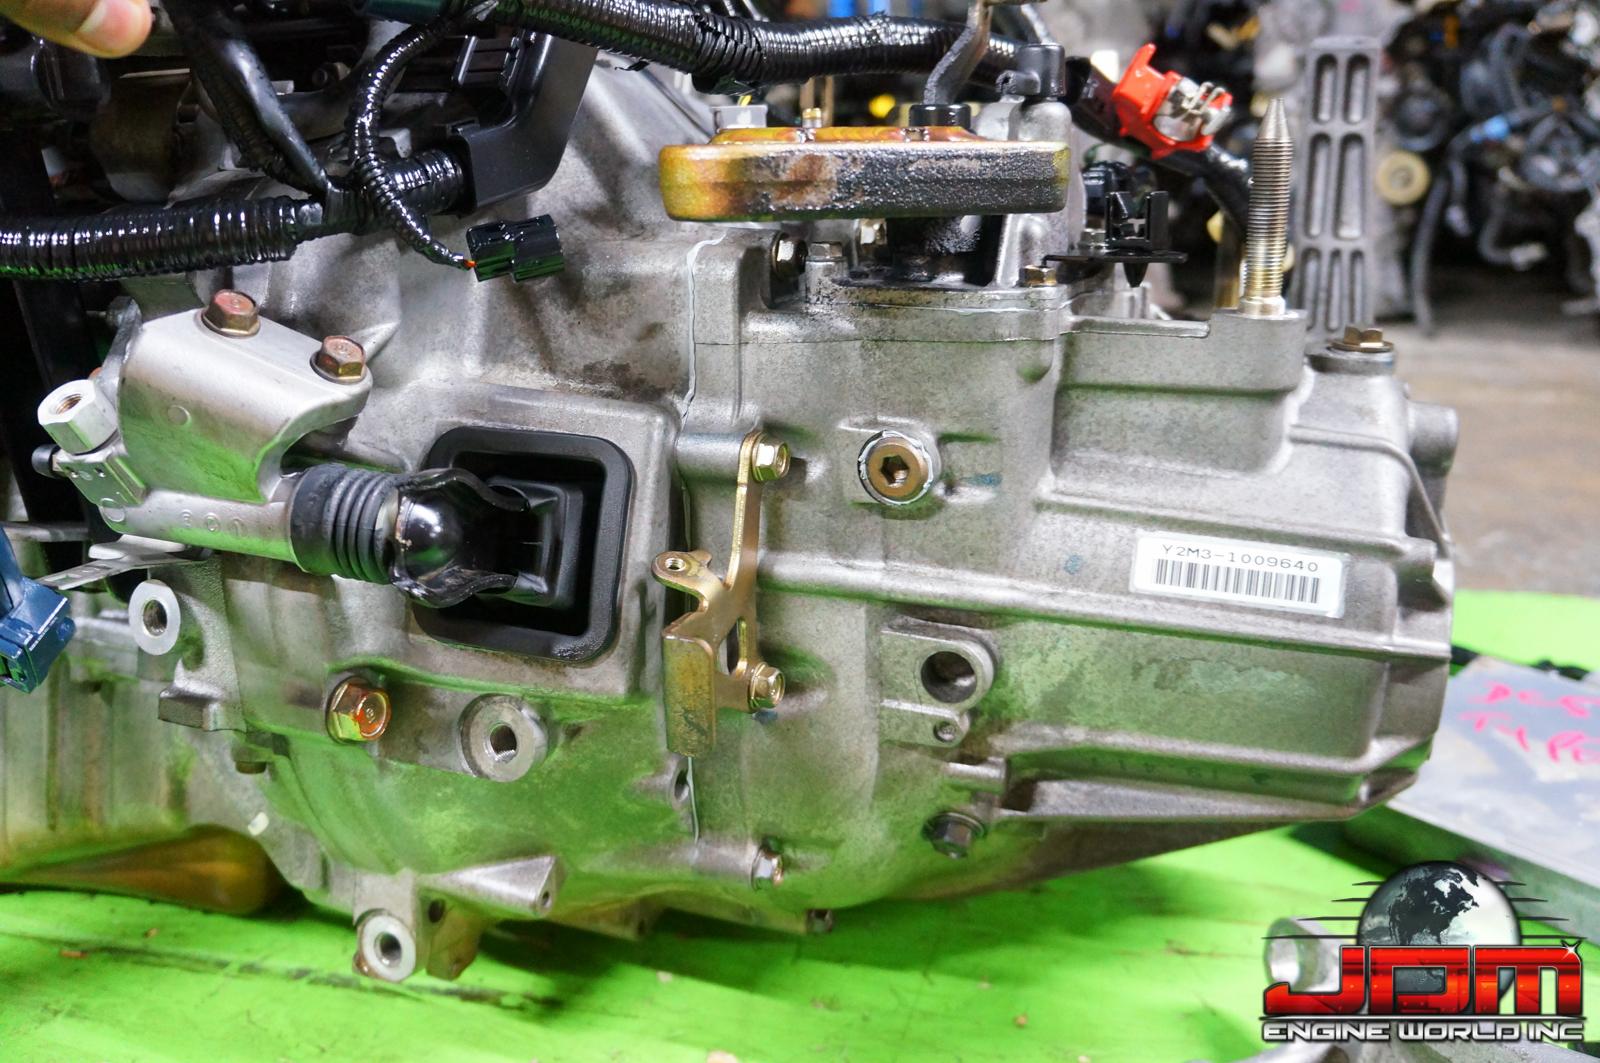 JDM K20A TYPE-R DC5 ENGINE WITH LSD 6 SPEED TRANSMISSION